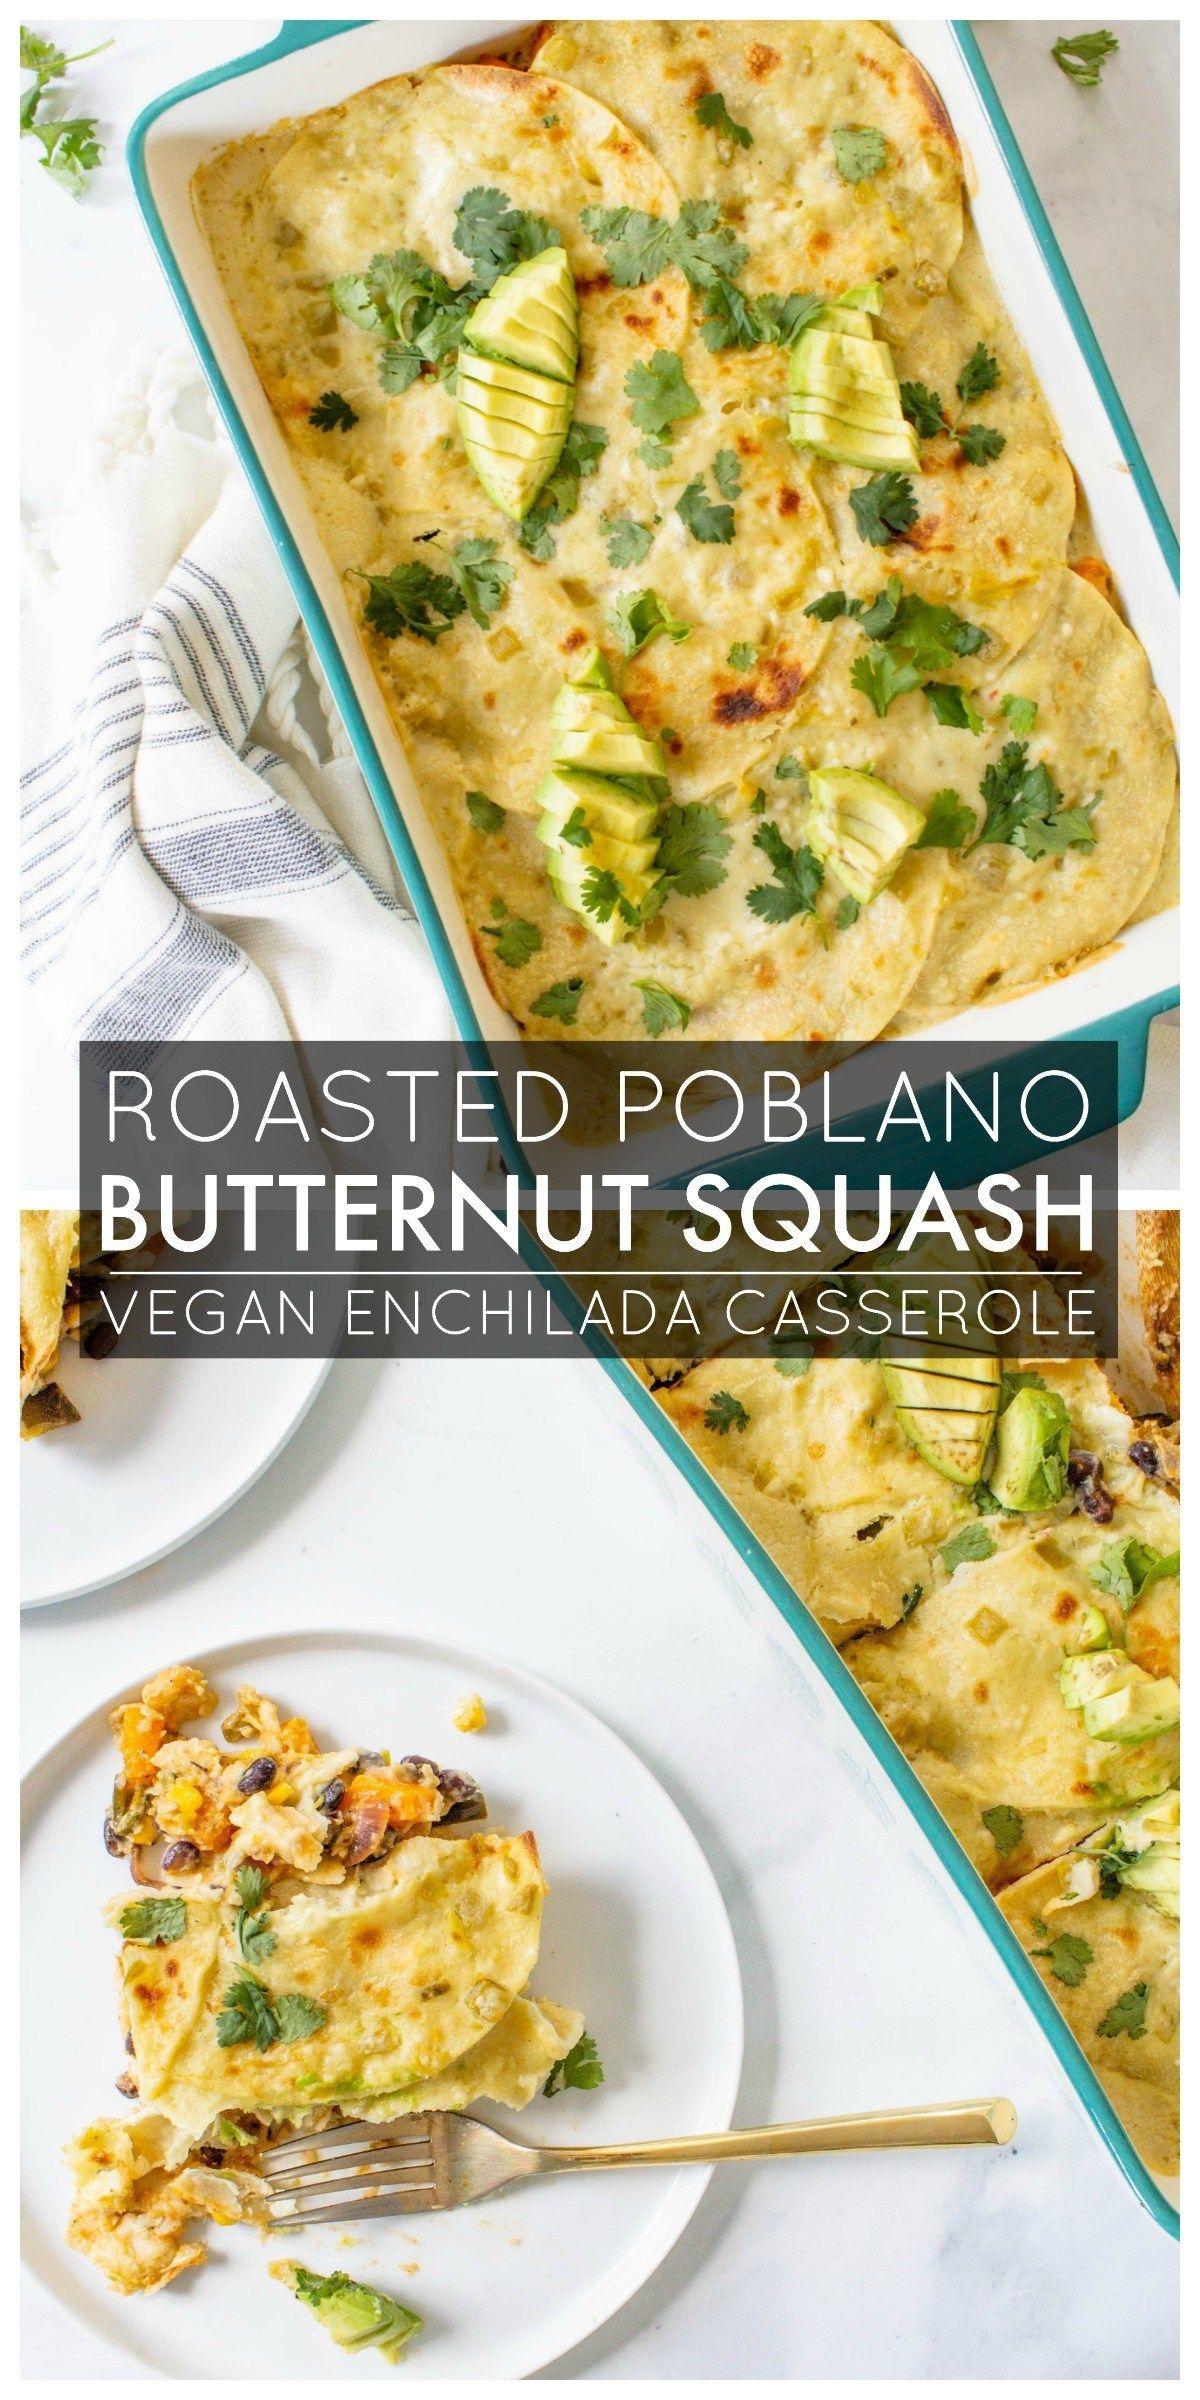 Vegan Butternut Squash Poblano Enchilada Casserole